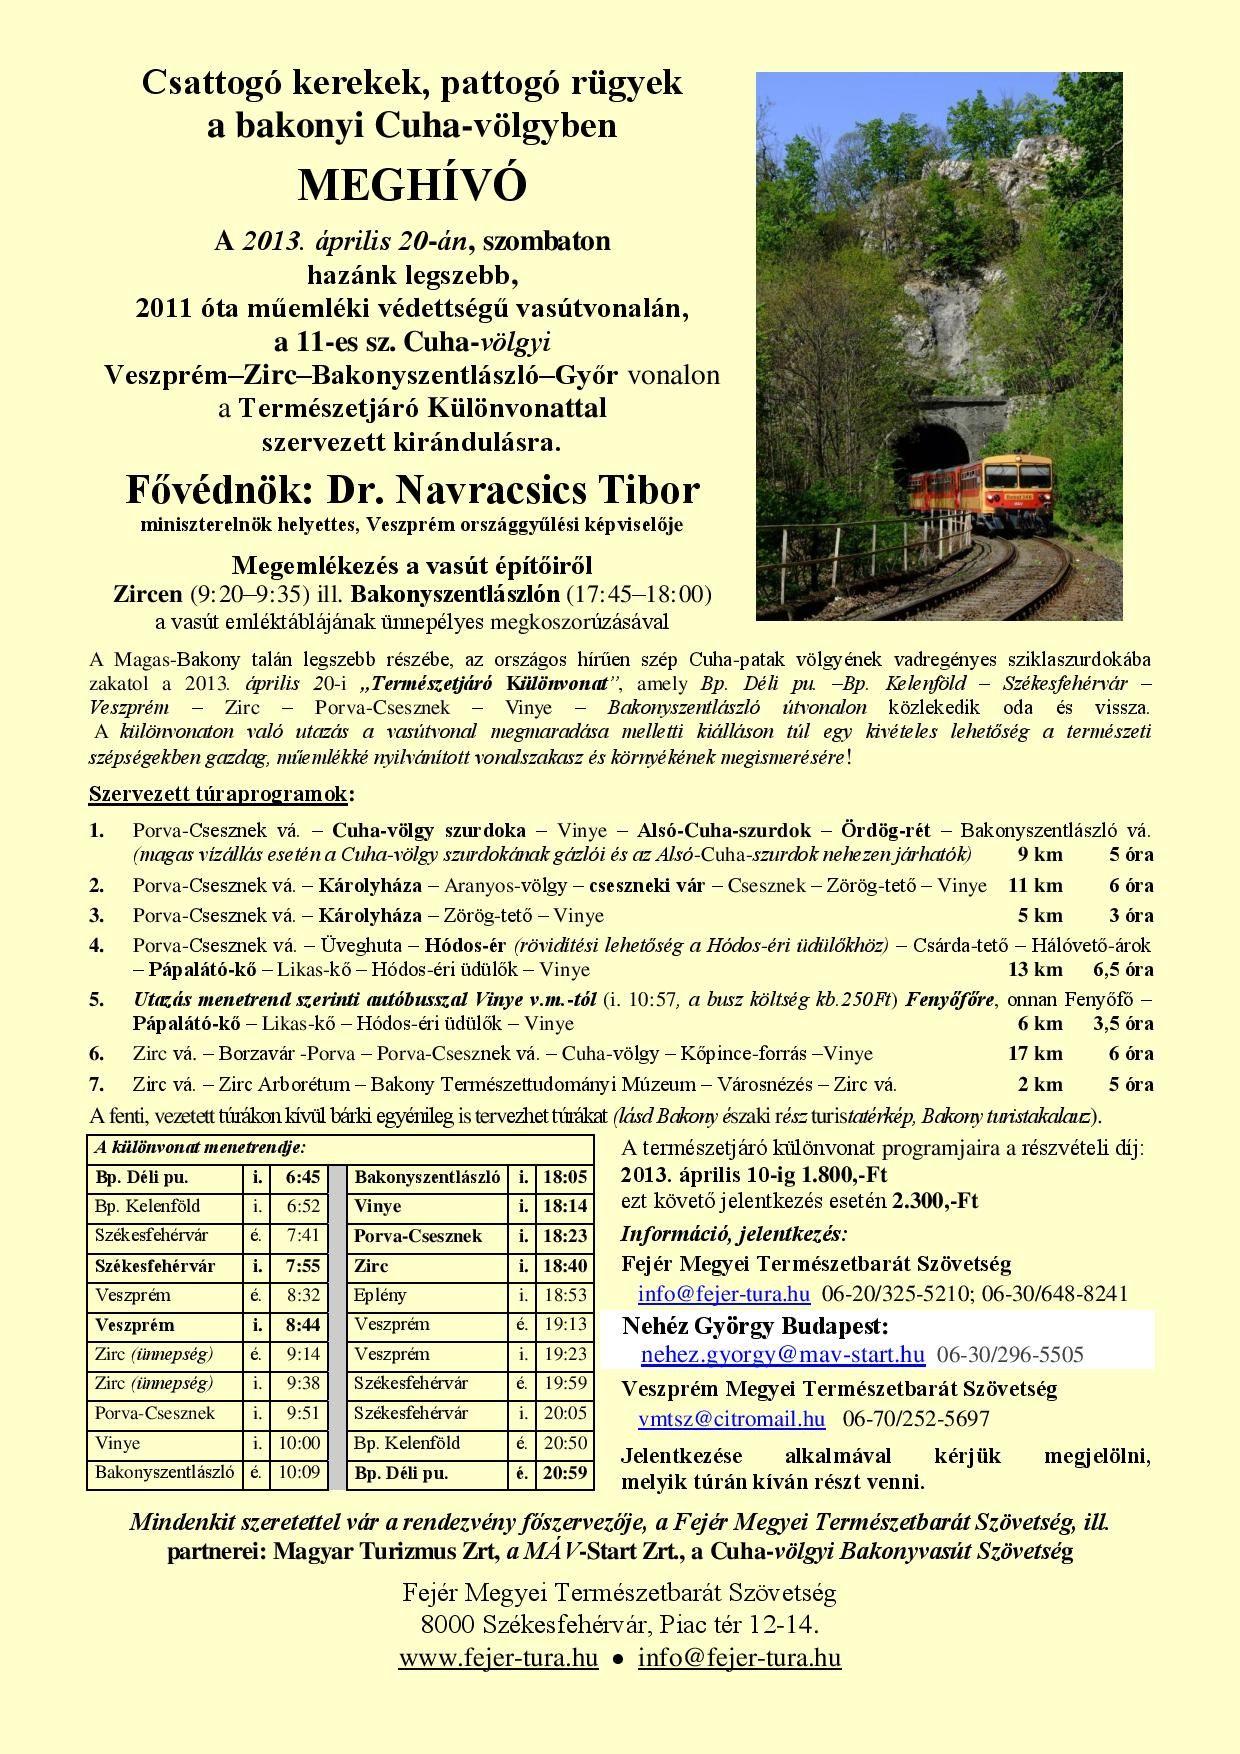 0420_kulonvonat_program_szorolap-page-001_1365416063.jpg_1240x1754